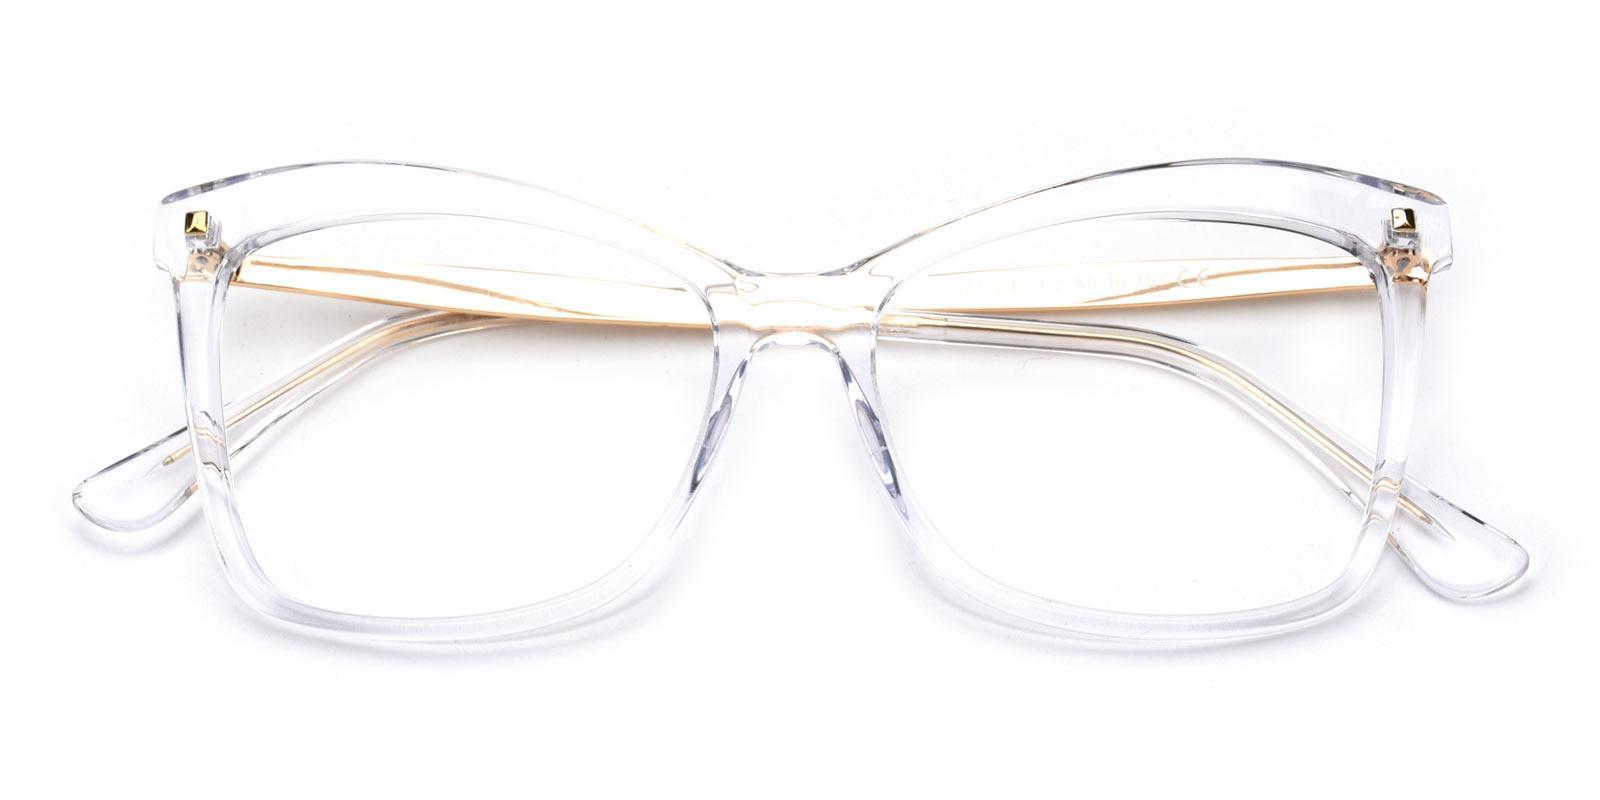 Gleen-Translucent-Cat-Combination-Eyeglasses-detail